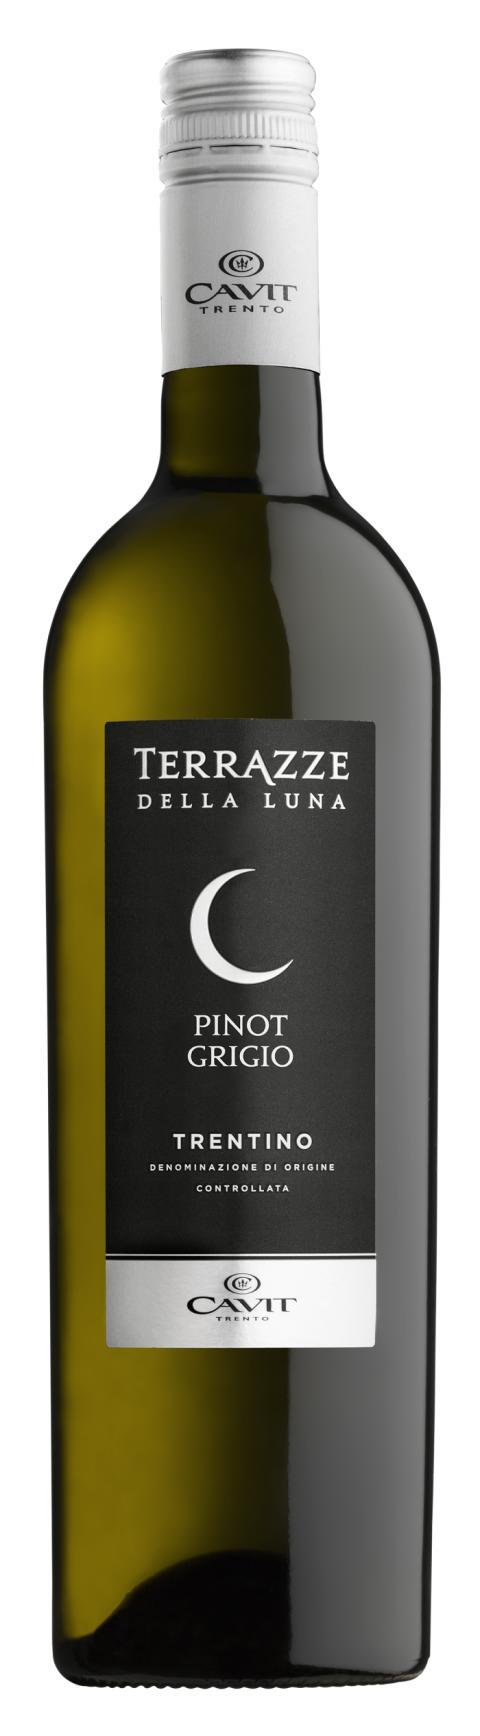 Den 1:a juni lanseras Terrazze della Luna Pinot Grigio DOC Trentino 2018 i samtliga butiker!